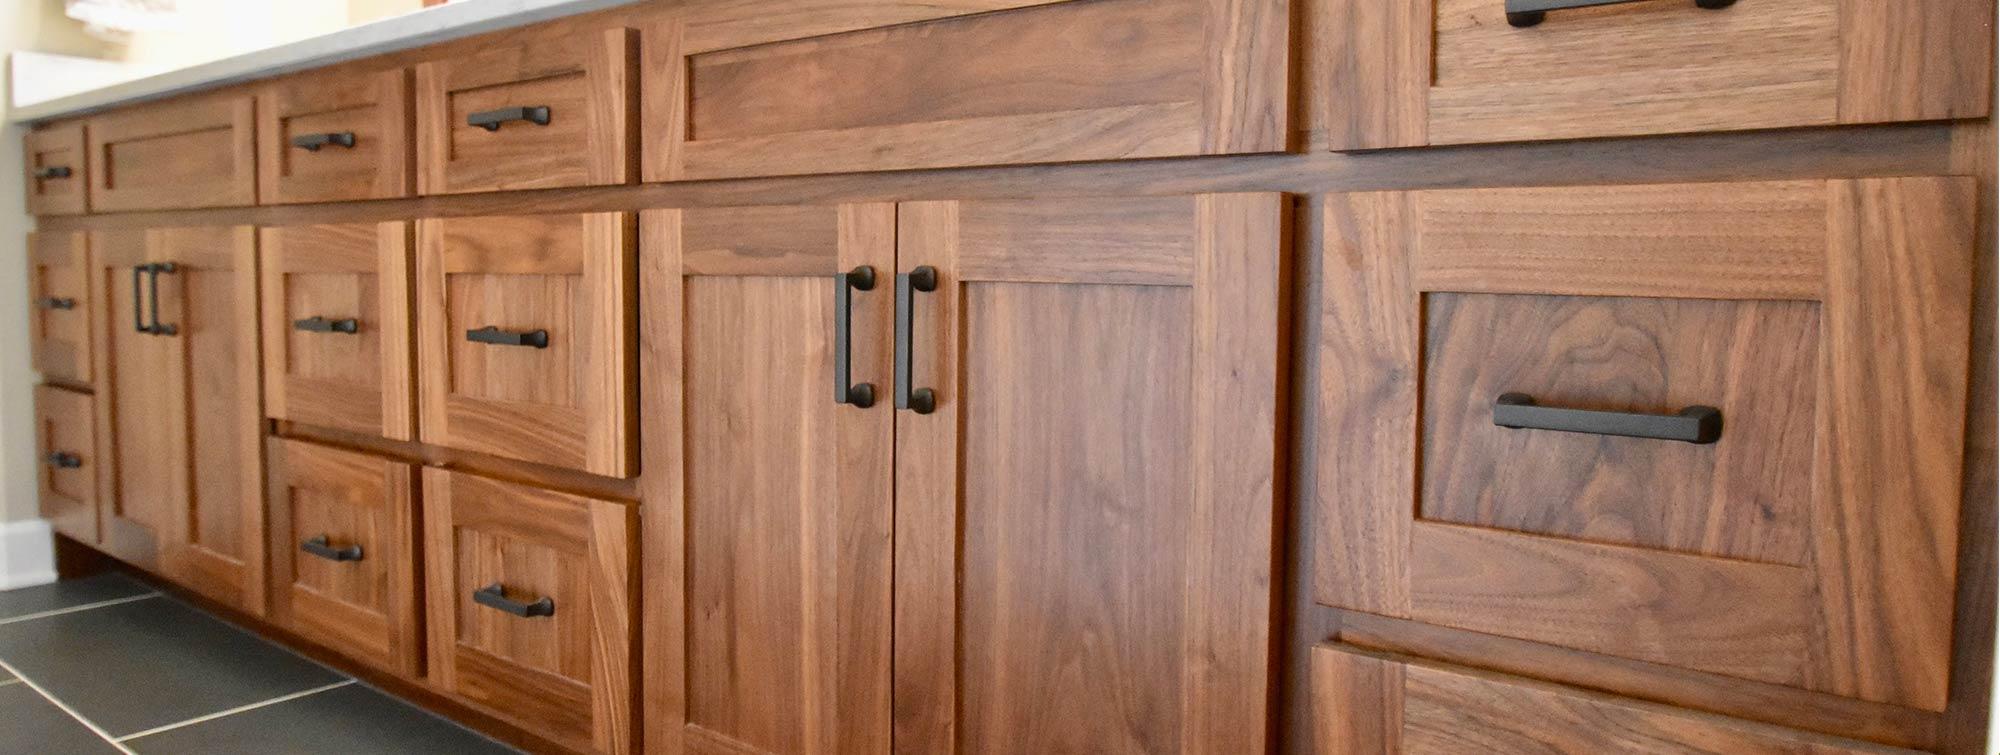 custom cabinets in dark wood finish with modern pulls